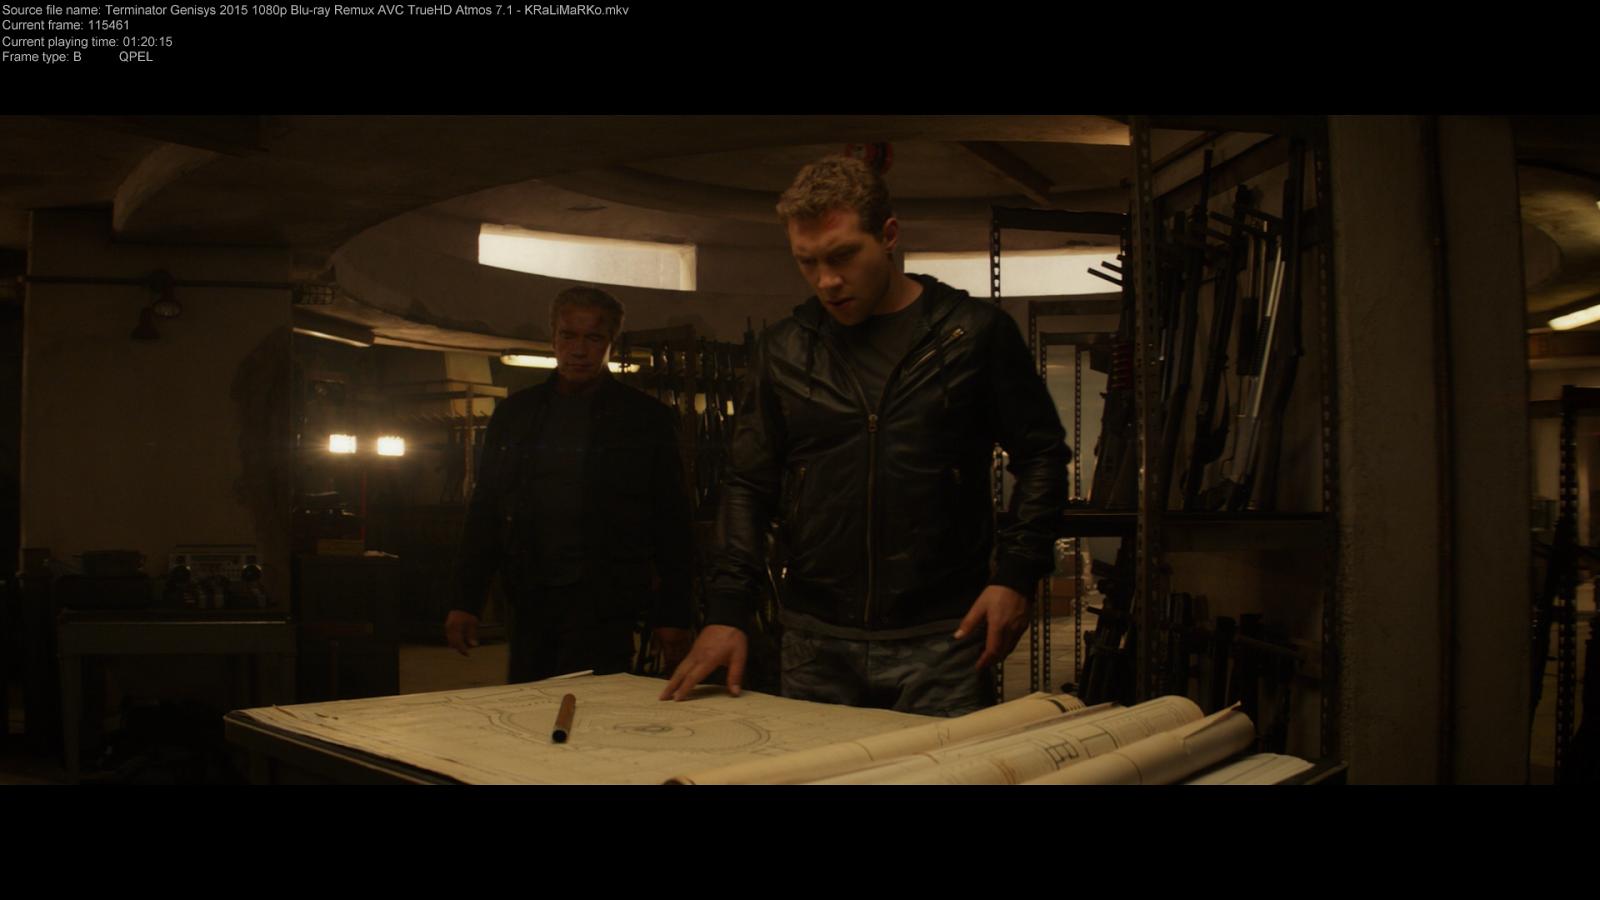 Terminator Genesis (2015) 1080p BD25 2D y 3D 2